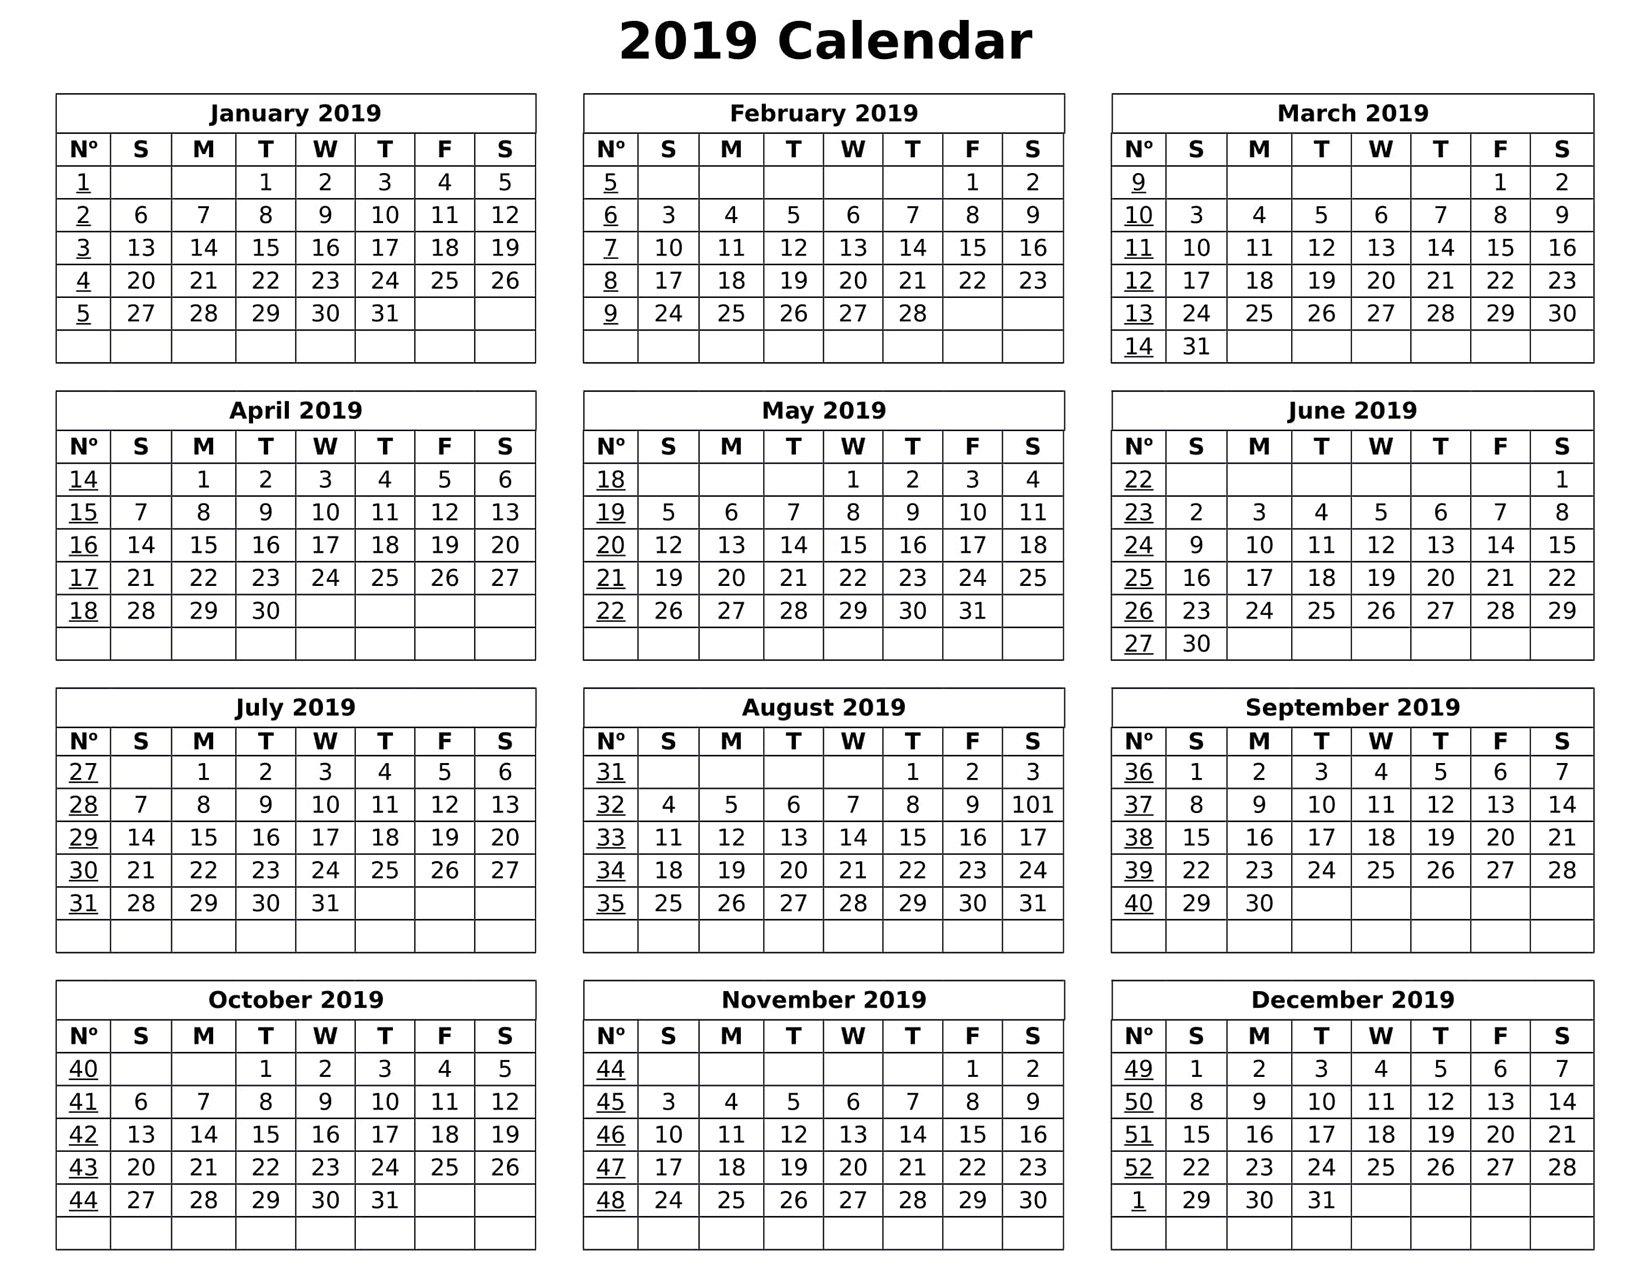 Full Year Calendar For 2019 – Free Calendar Templates & Worksheets Calendar 2019 Entire Year